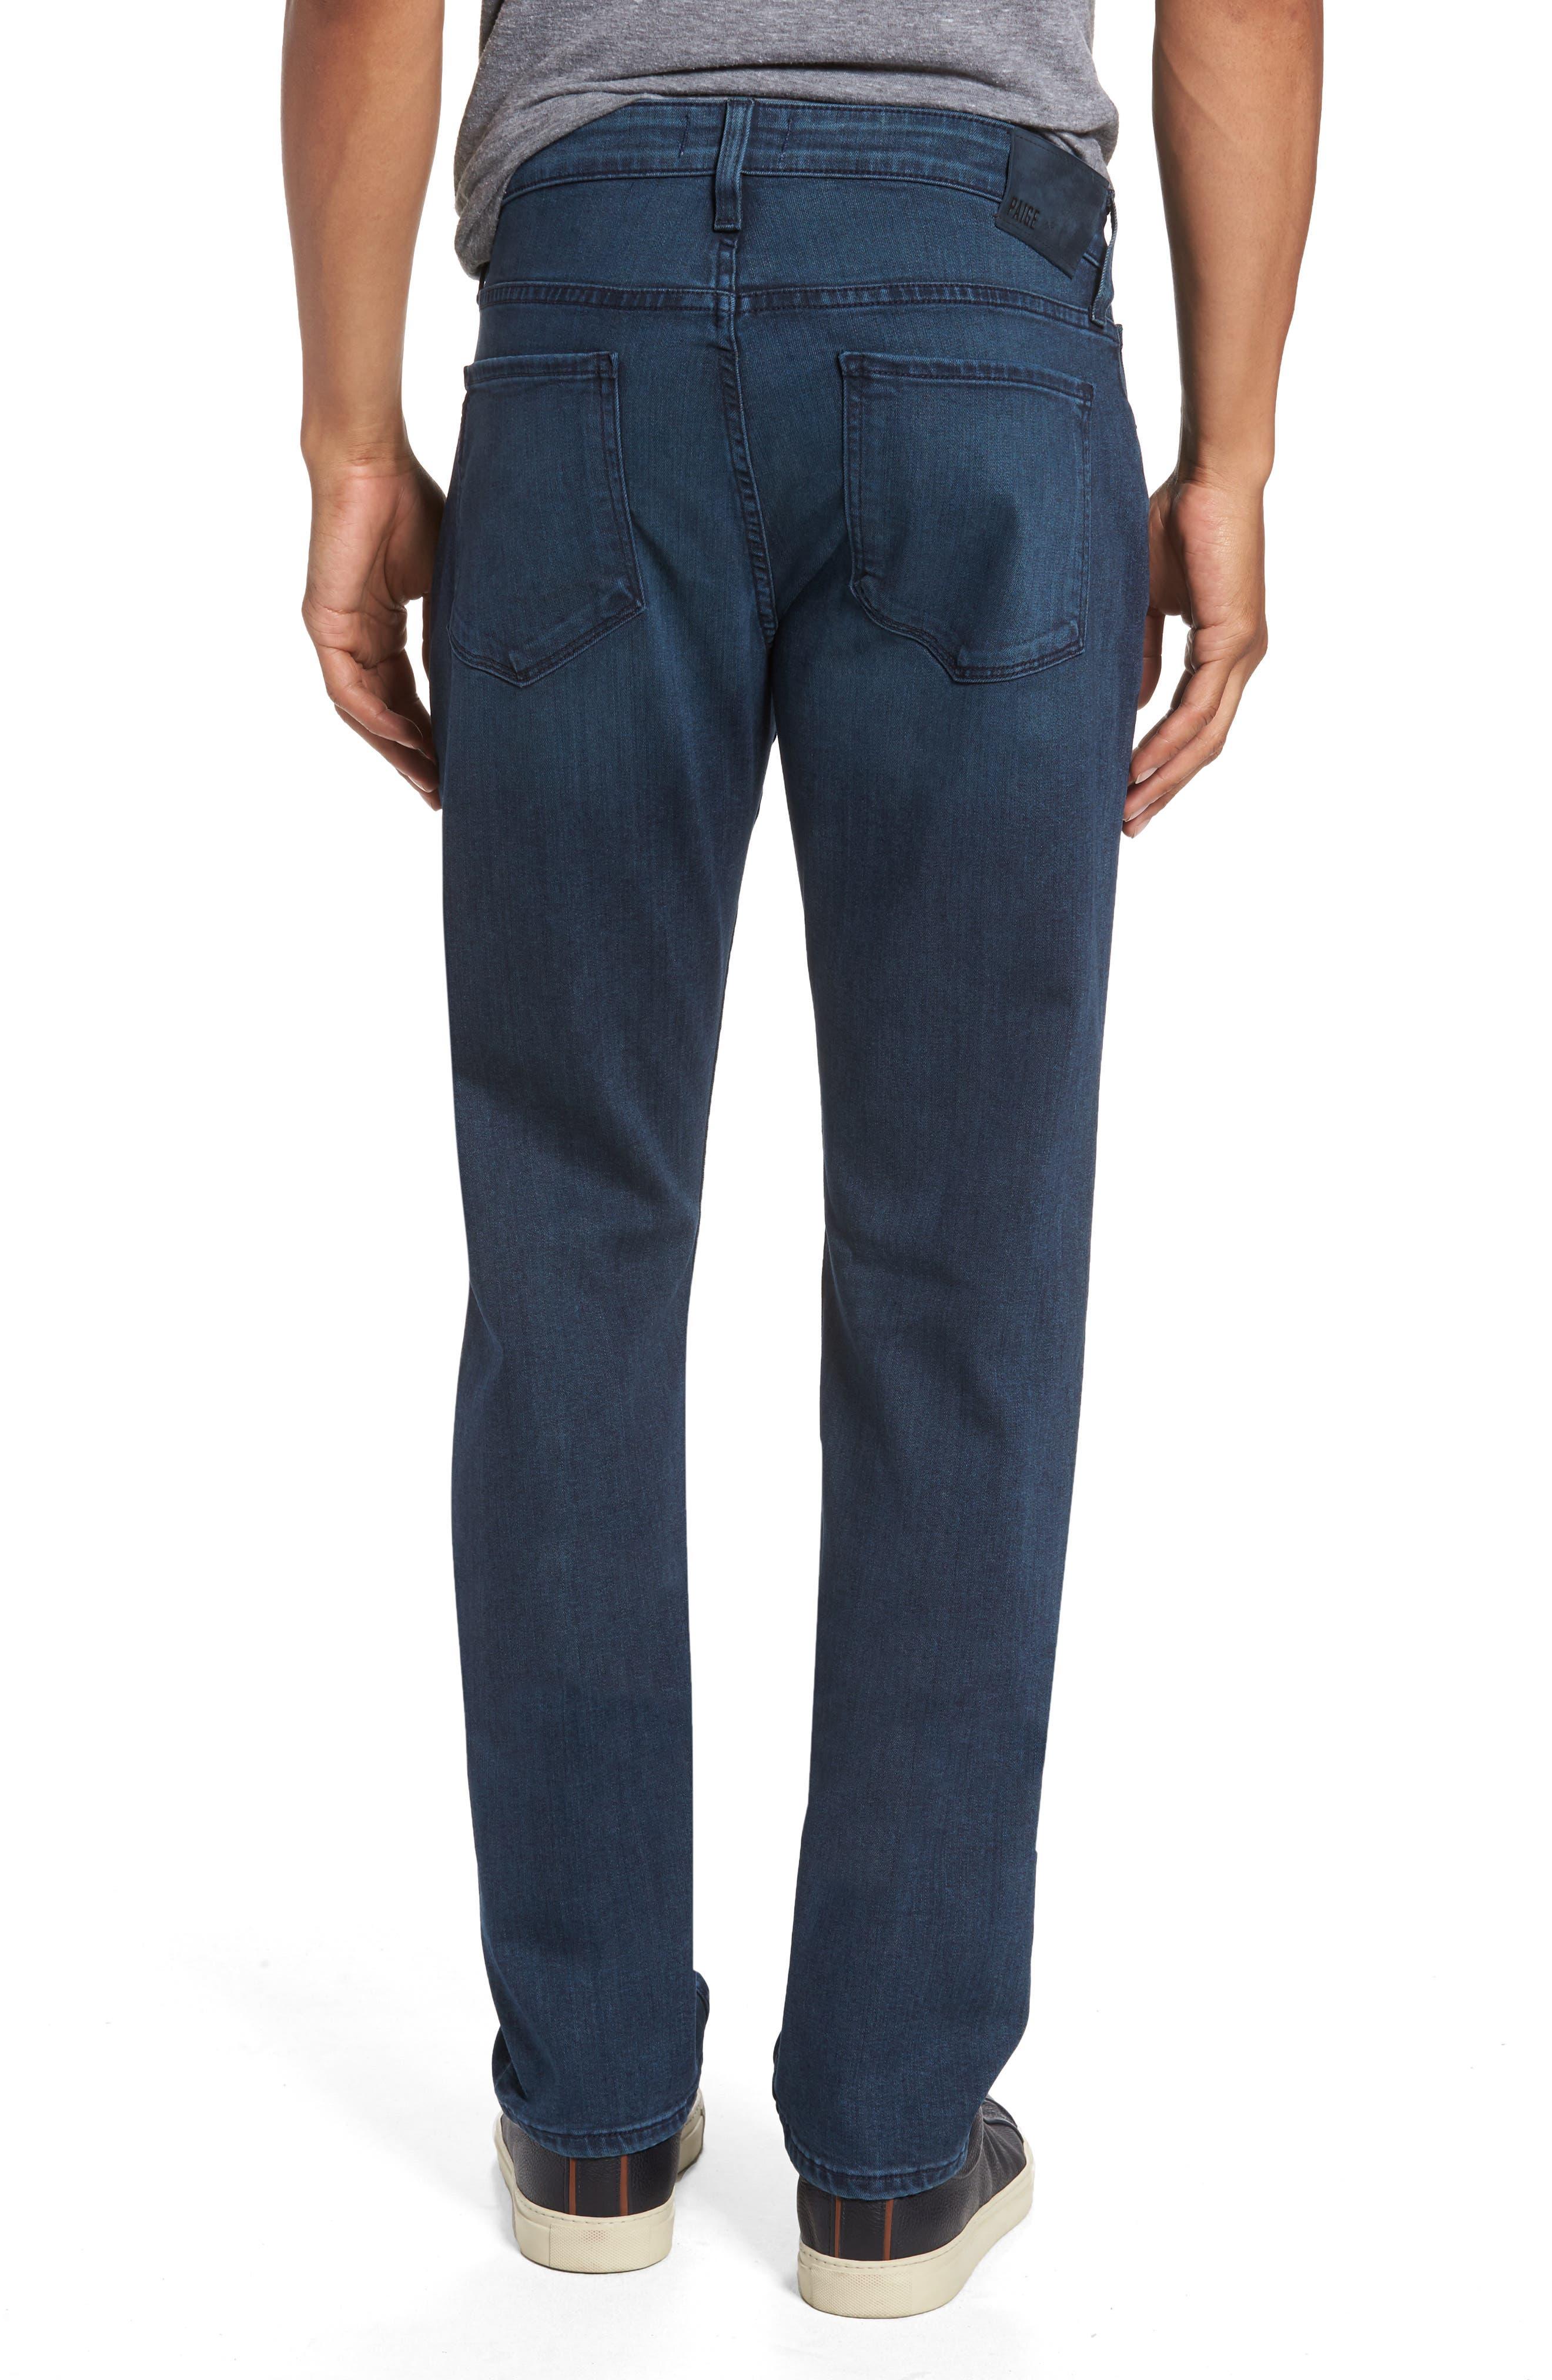 Transcend - Federal Slim Straight Fit Jeans,                             Alternate thumbnail 2, color,                             Elroy